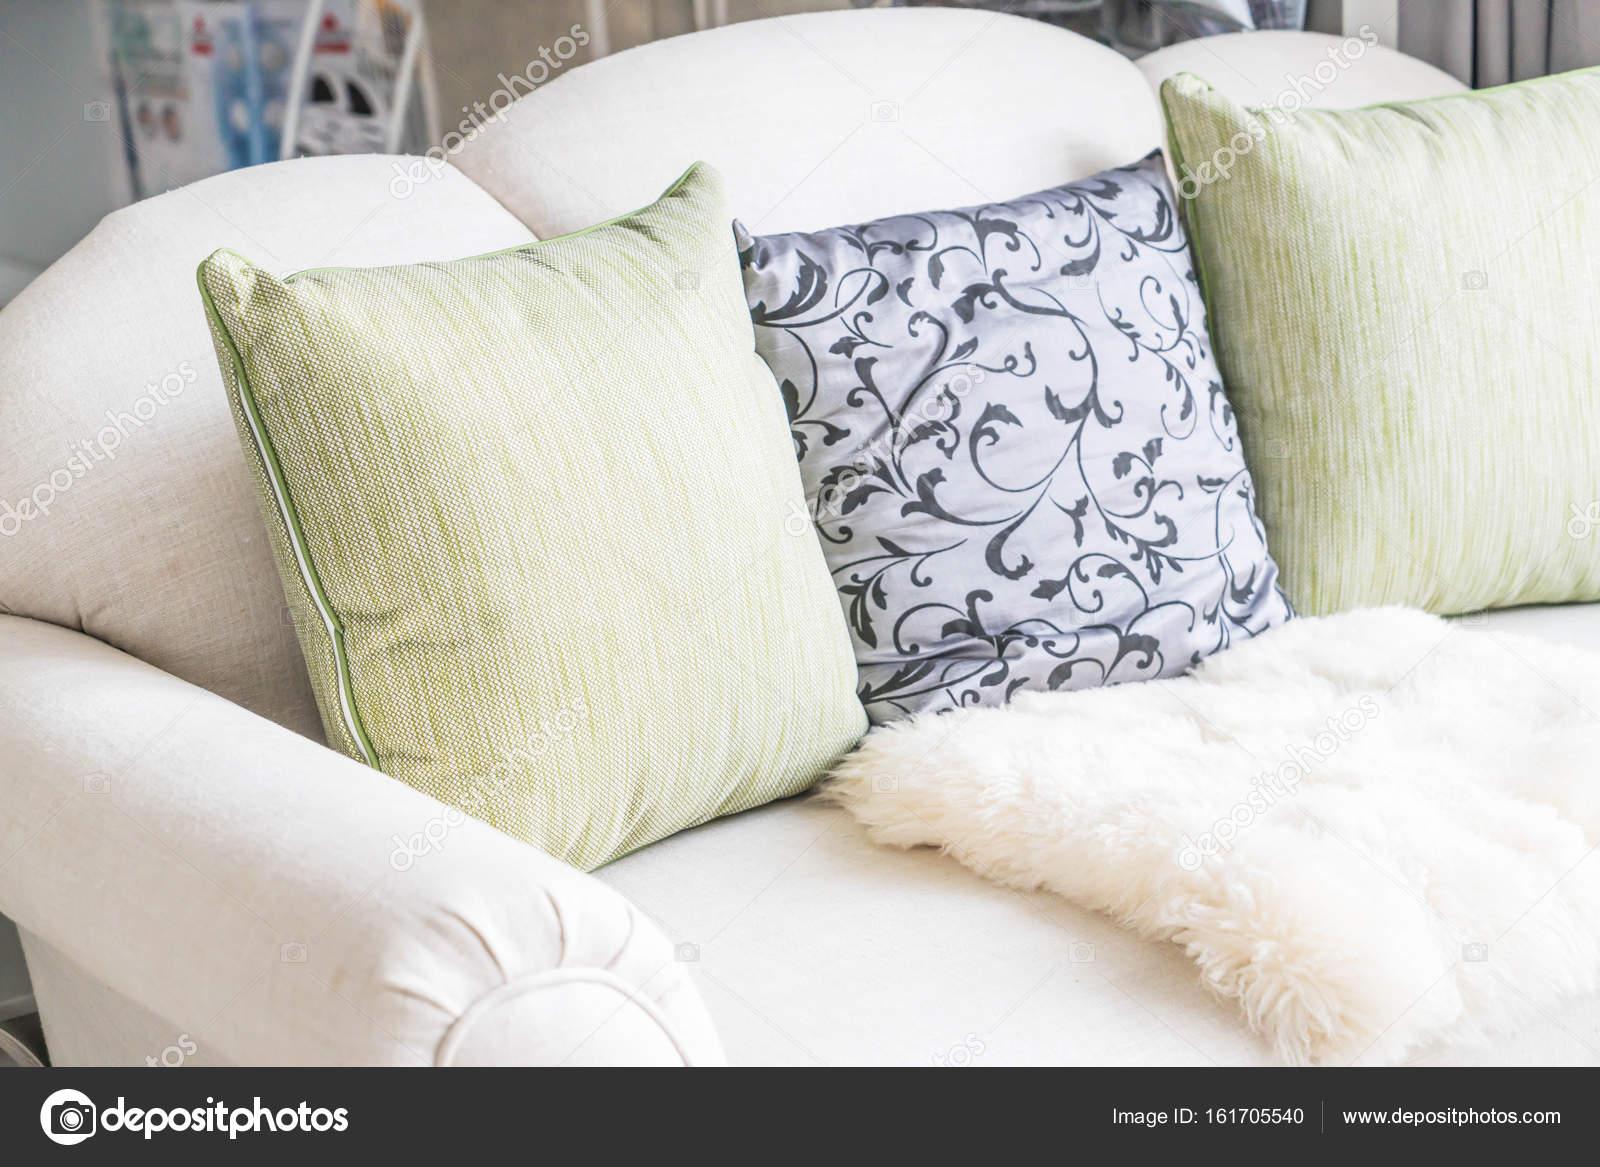 Schone Kissen Auf Sofa Stockfoto C Topntp 161705540